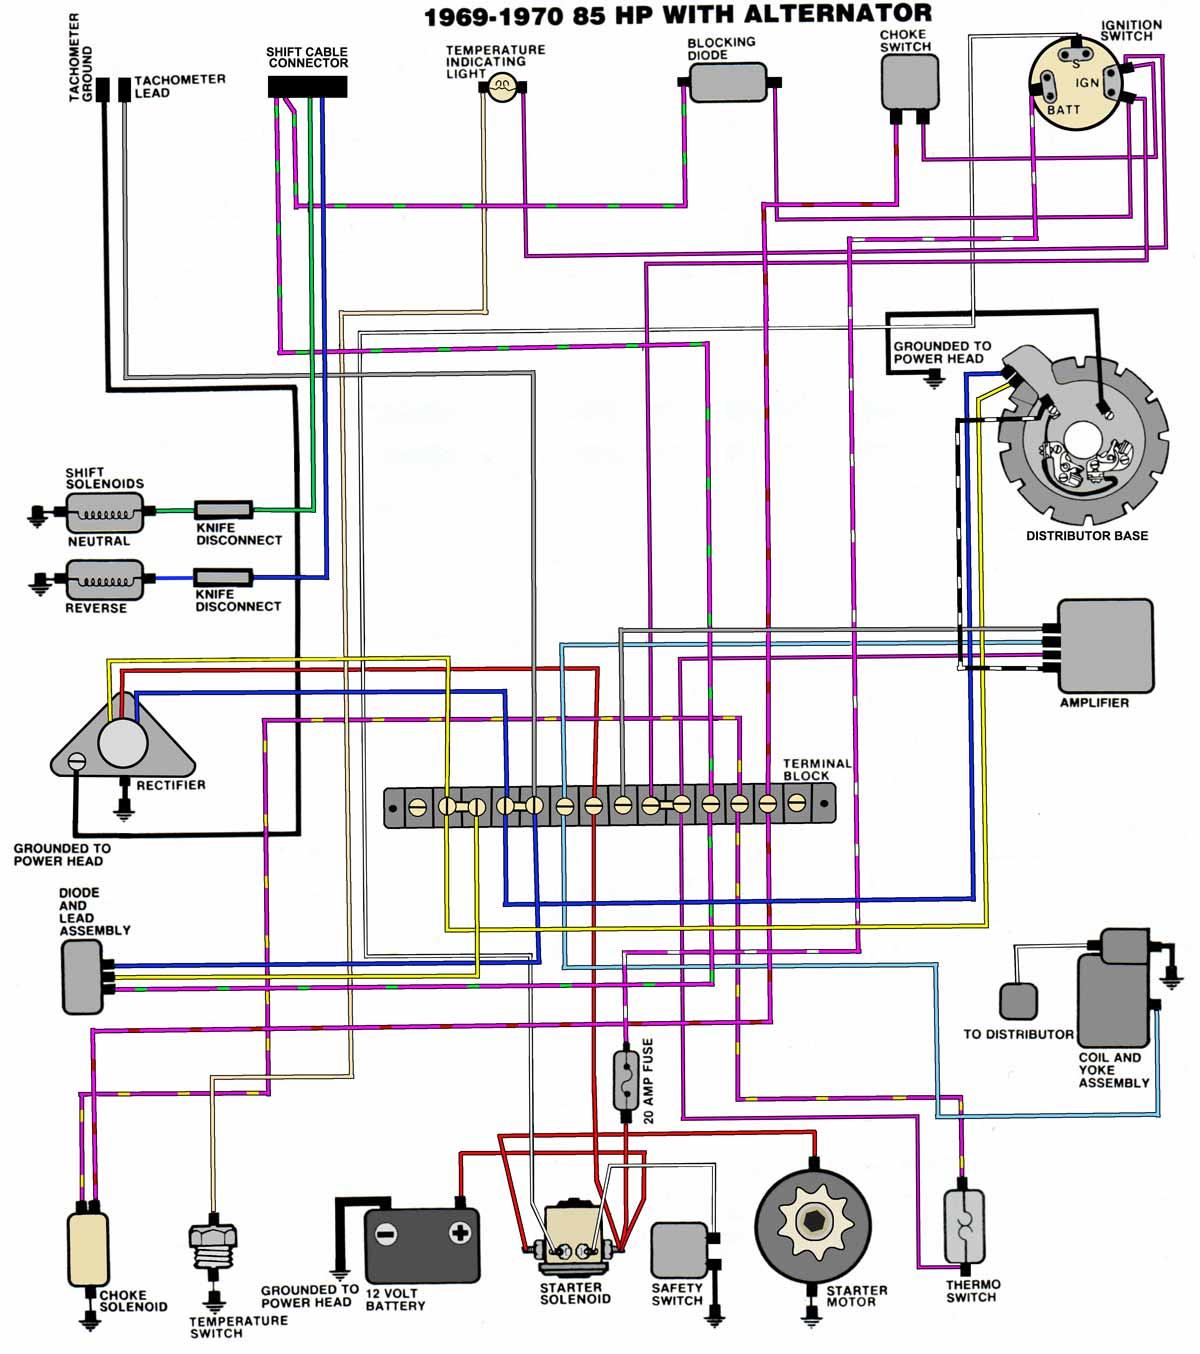 johnson outboard motors specifications motorssite org rh motorssite org